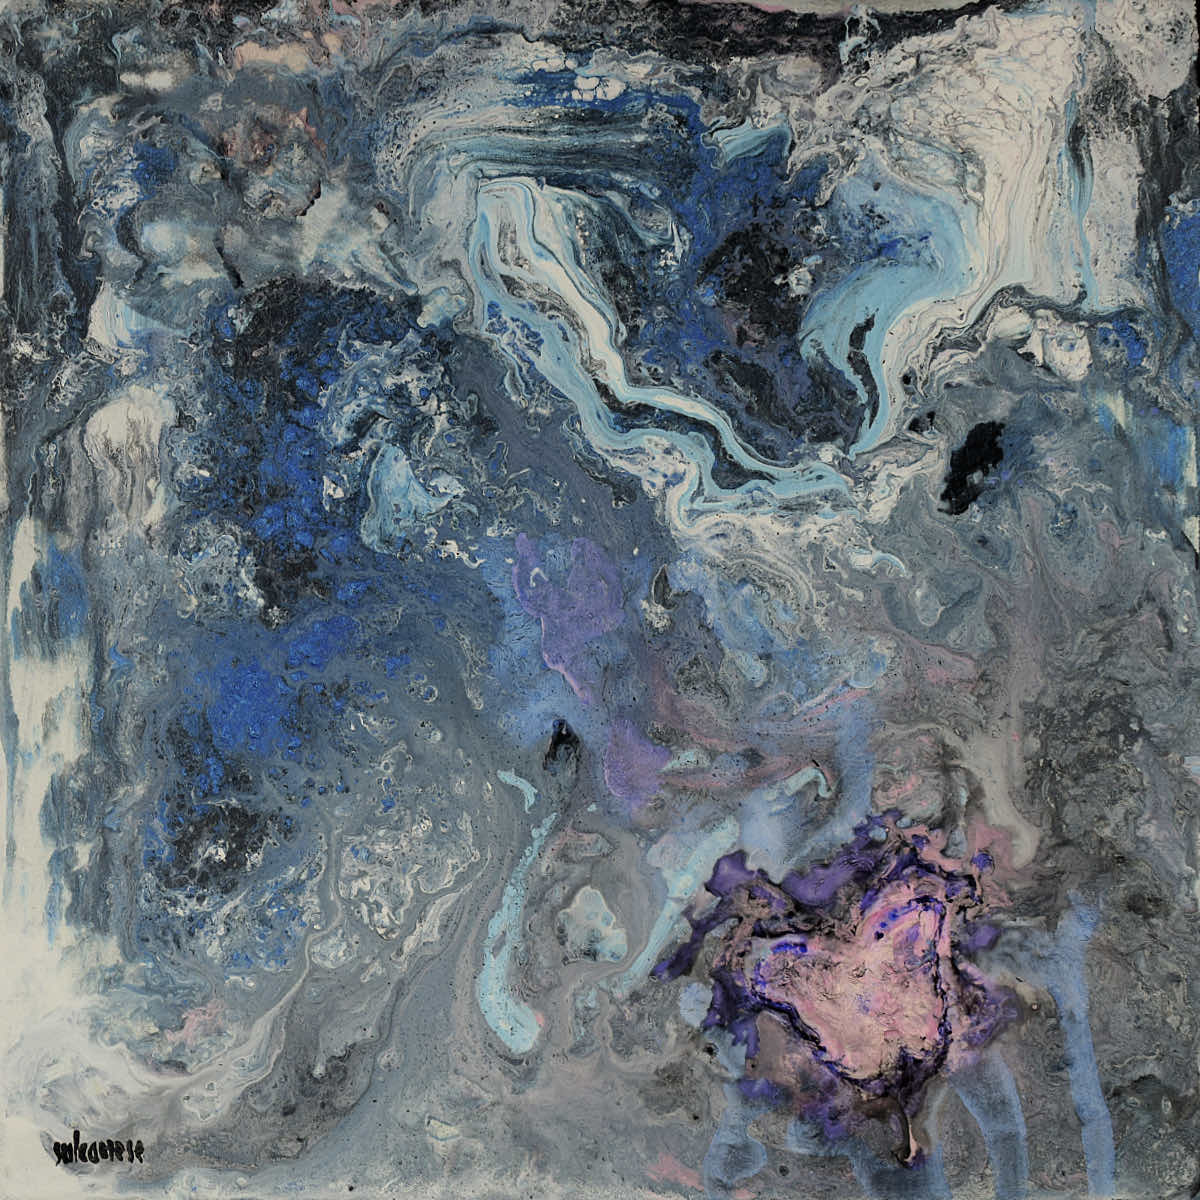 Piccole storie di farfalle (blu e dintorni/2), 2021, tecnica mista su tela, cm. 30x30x4,5